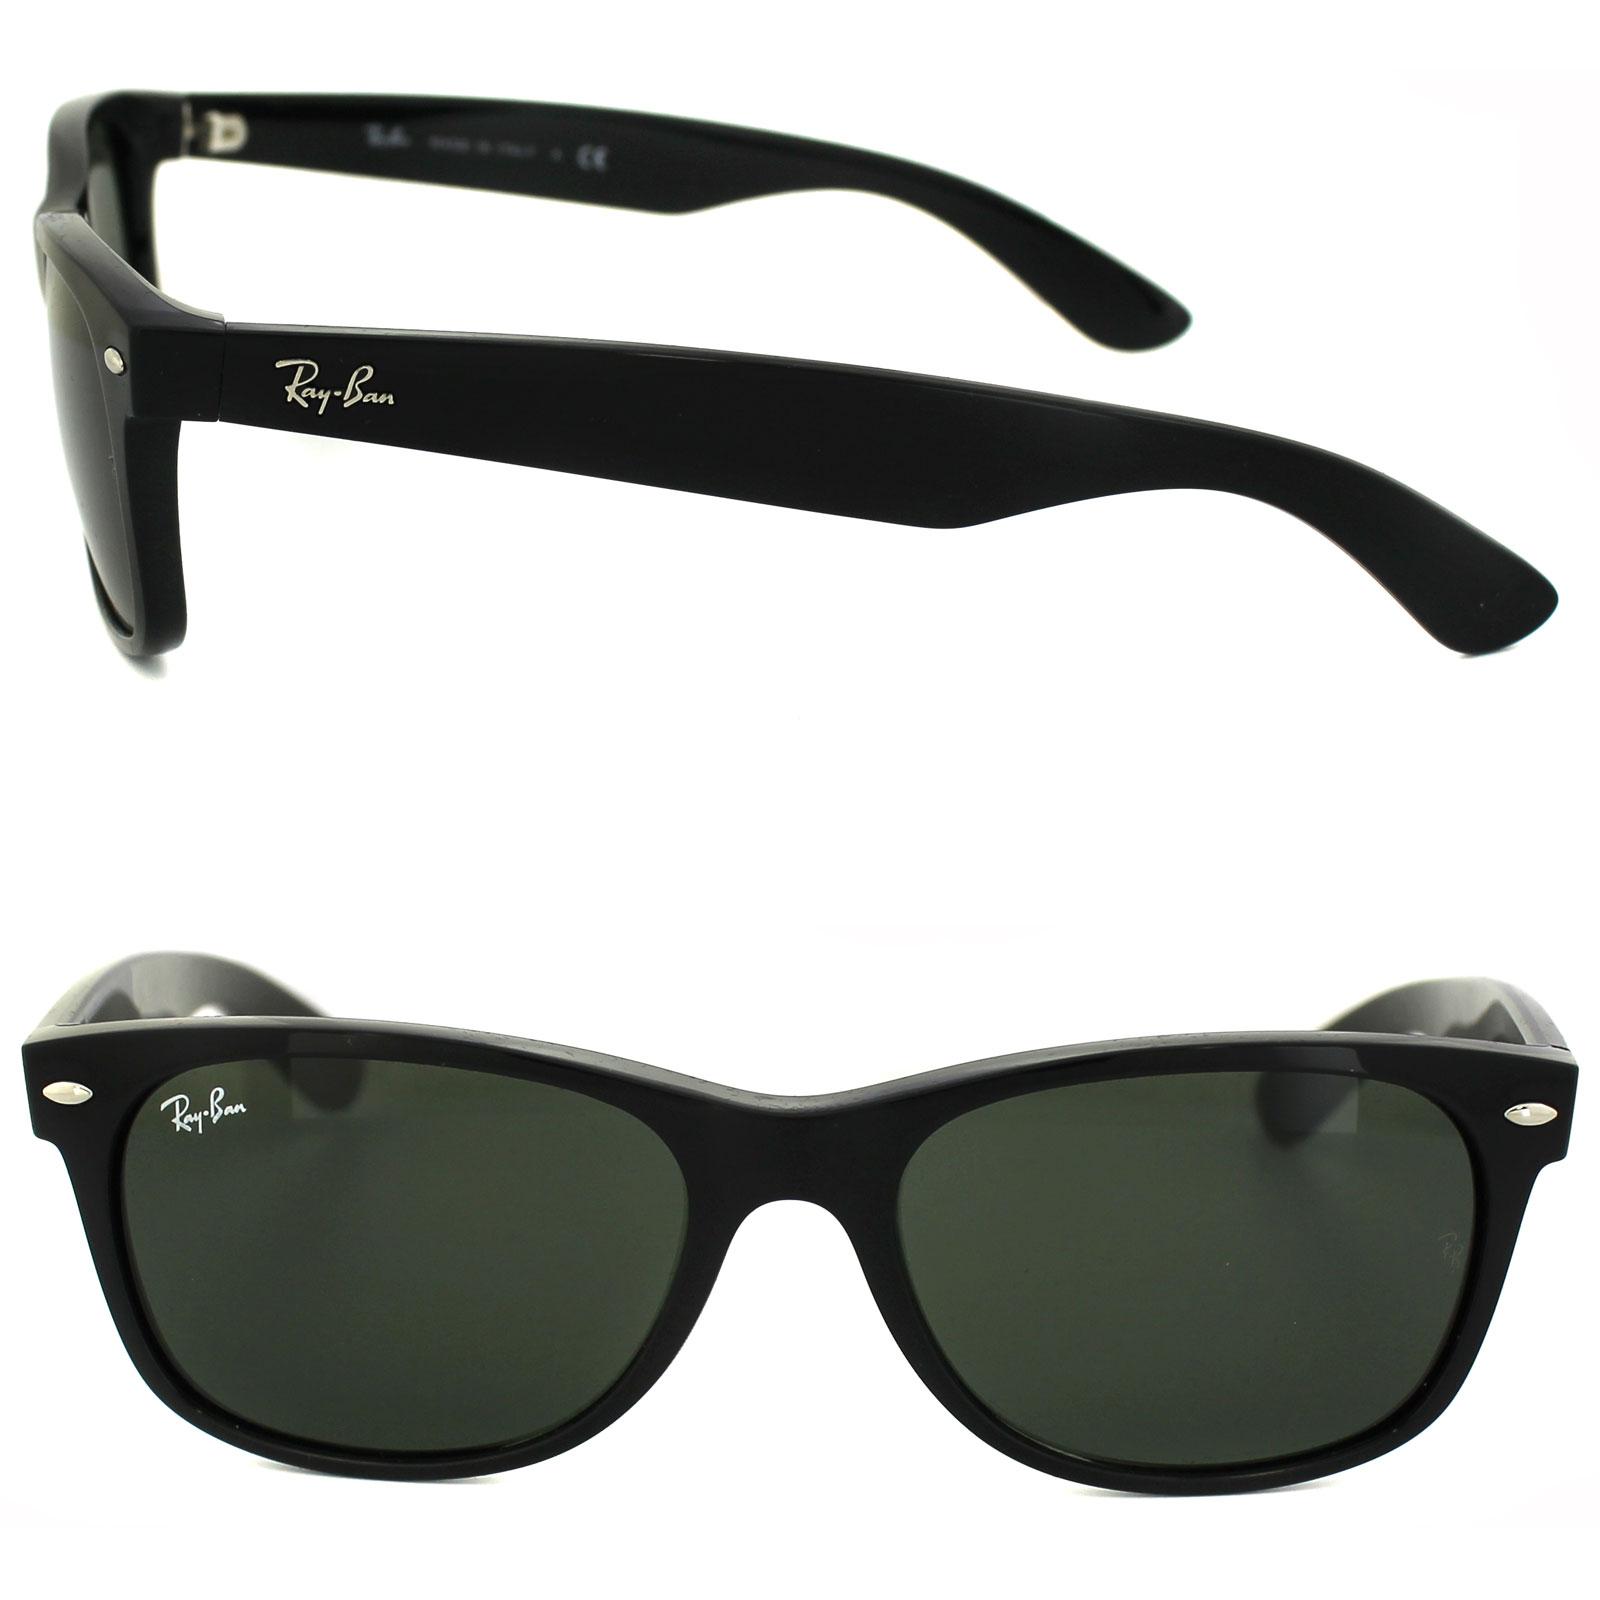 236dc8f0ea9b4 Sentinel Ray-Ban Sunglasses New Wayfarer 2132 901L Black Green G-15 Medium